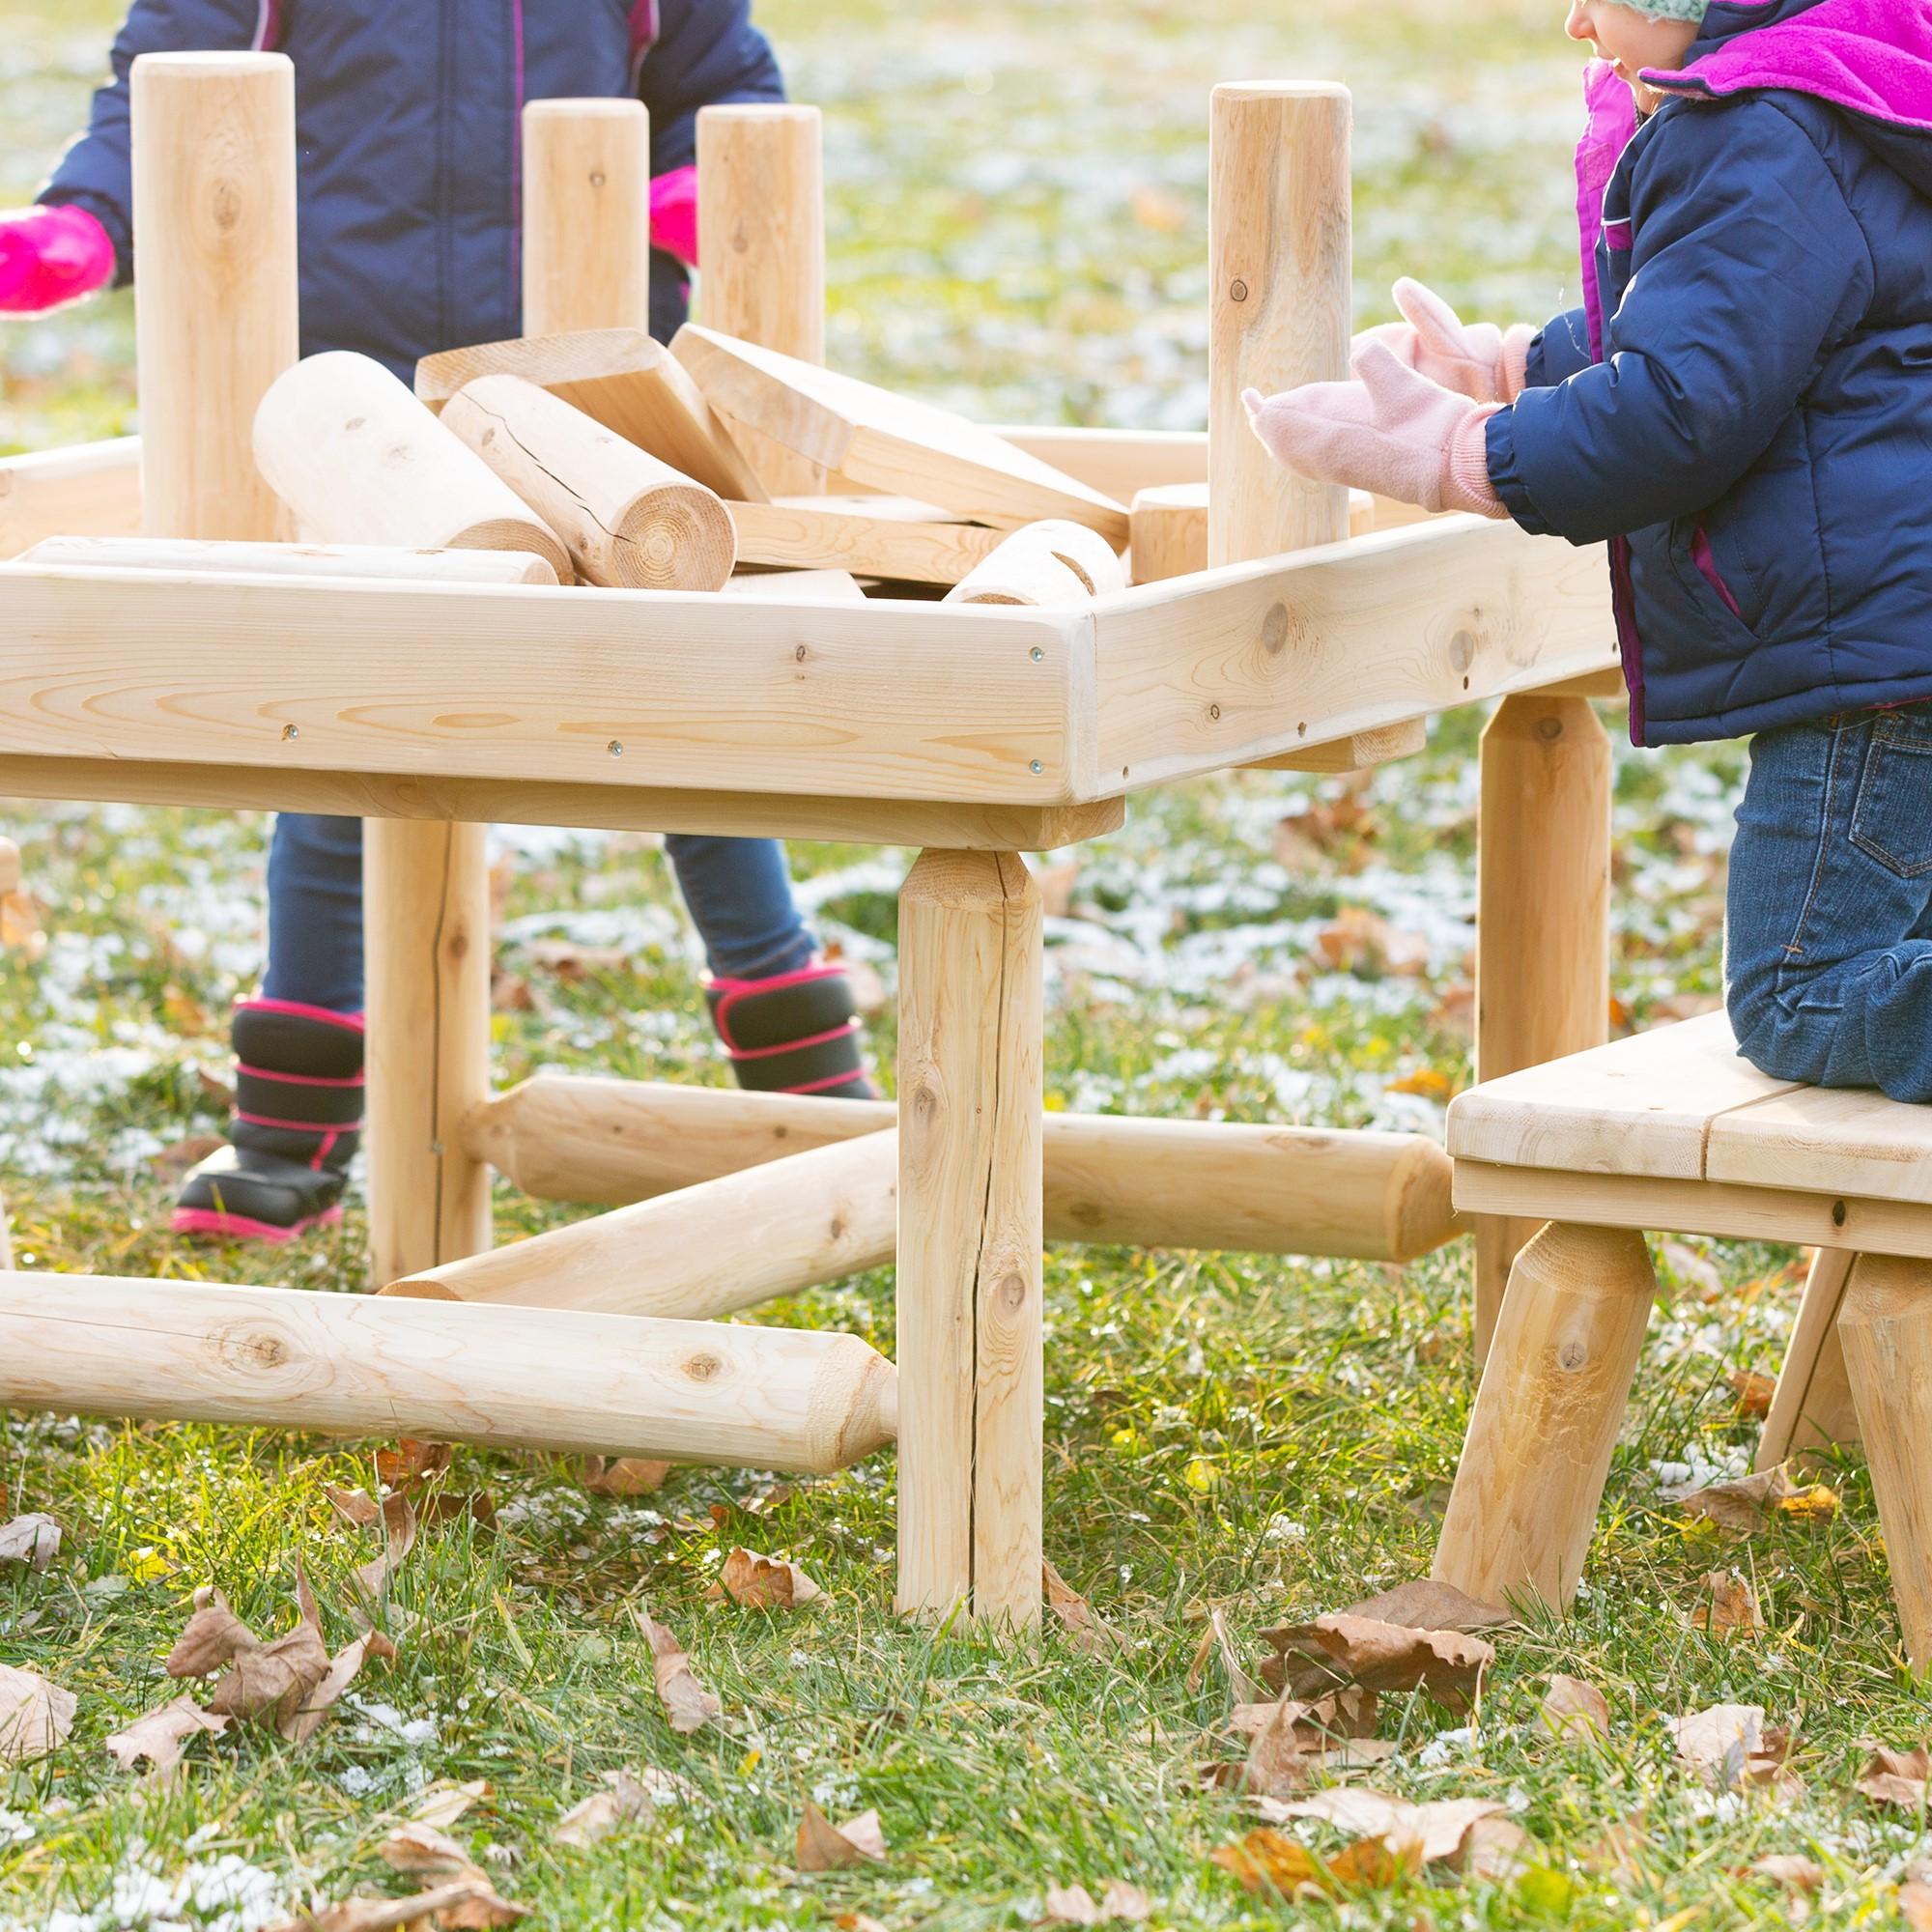 SPG-KEE2012-SO Sprogs Outdoor Preschool Cedar Bench 12 Seat Height